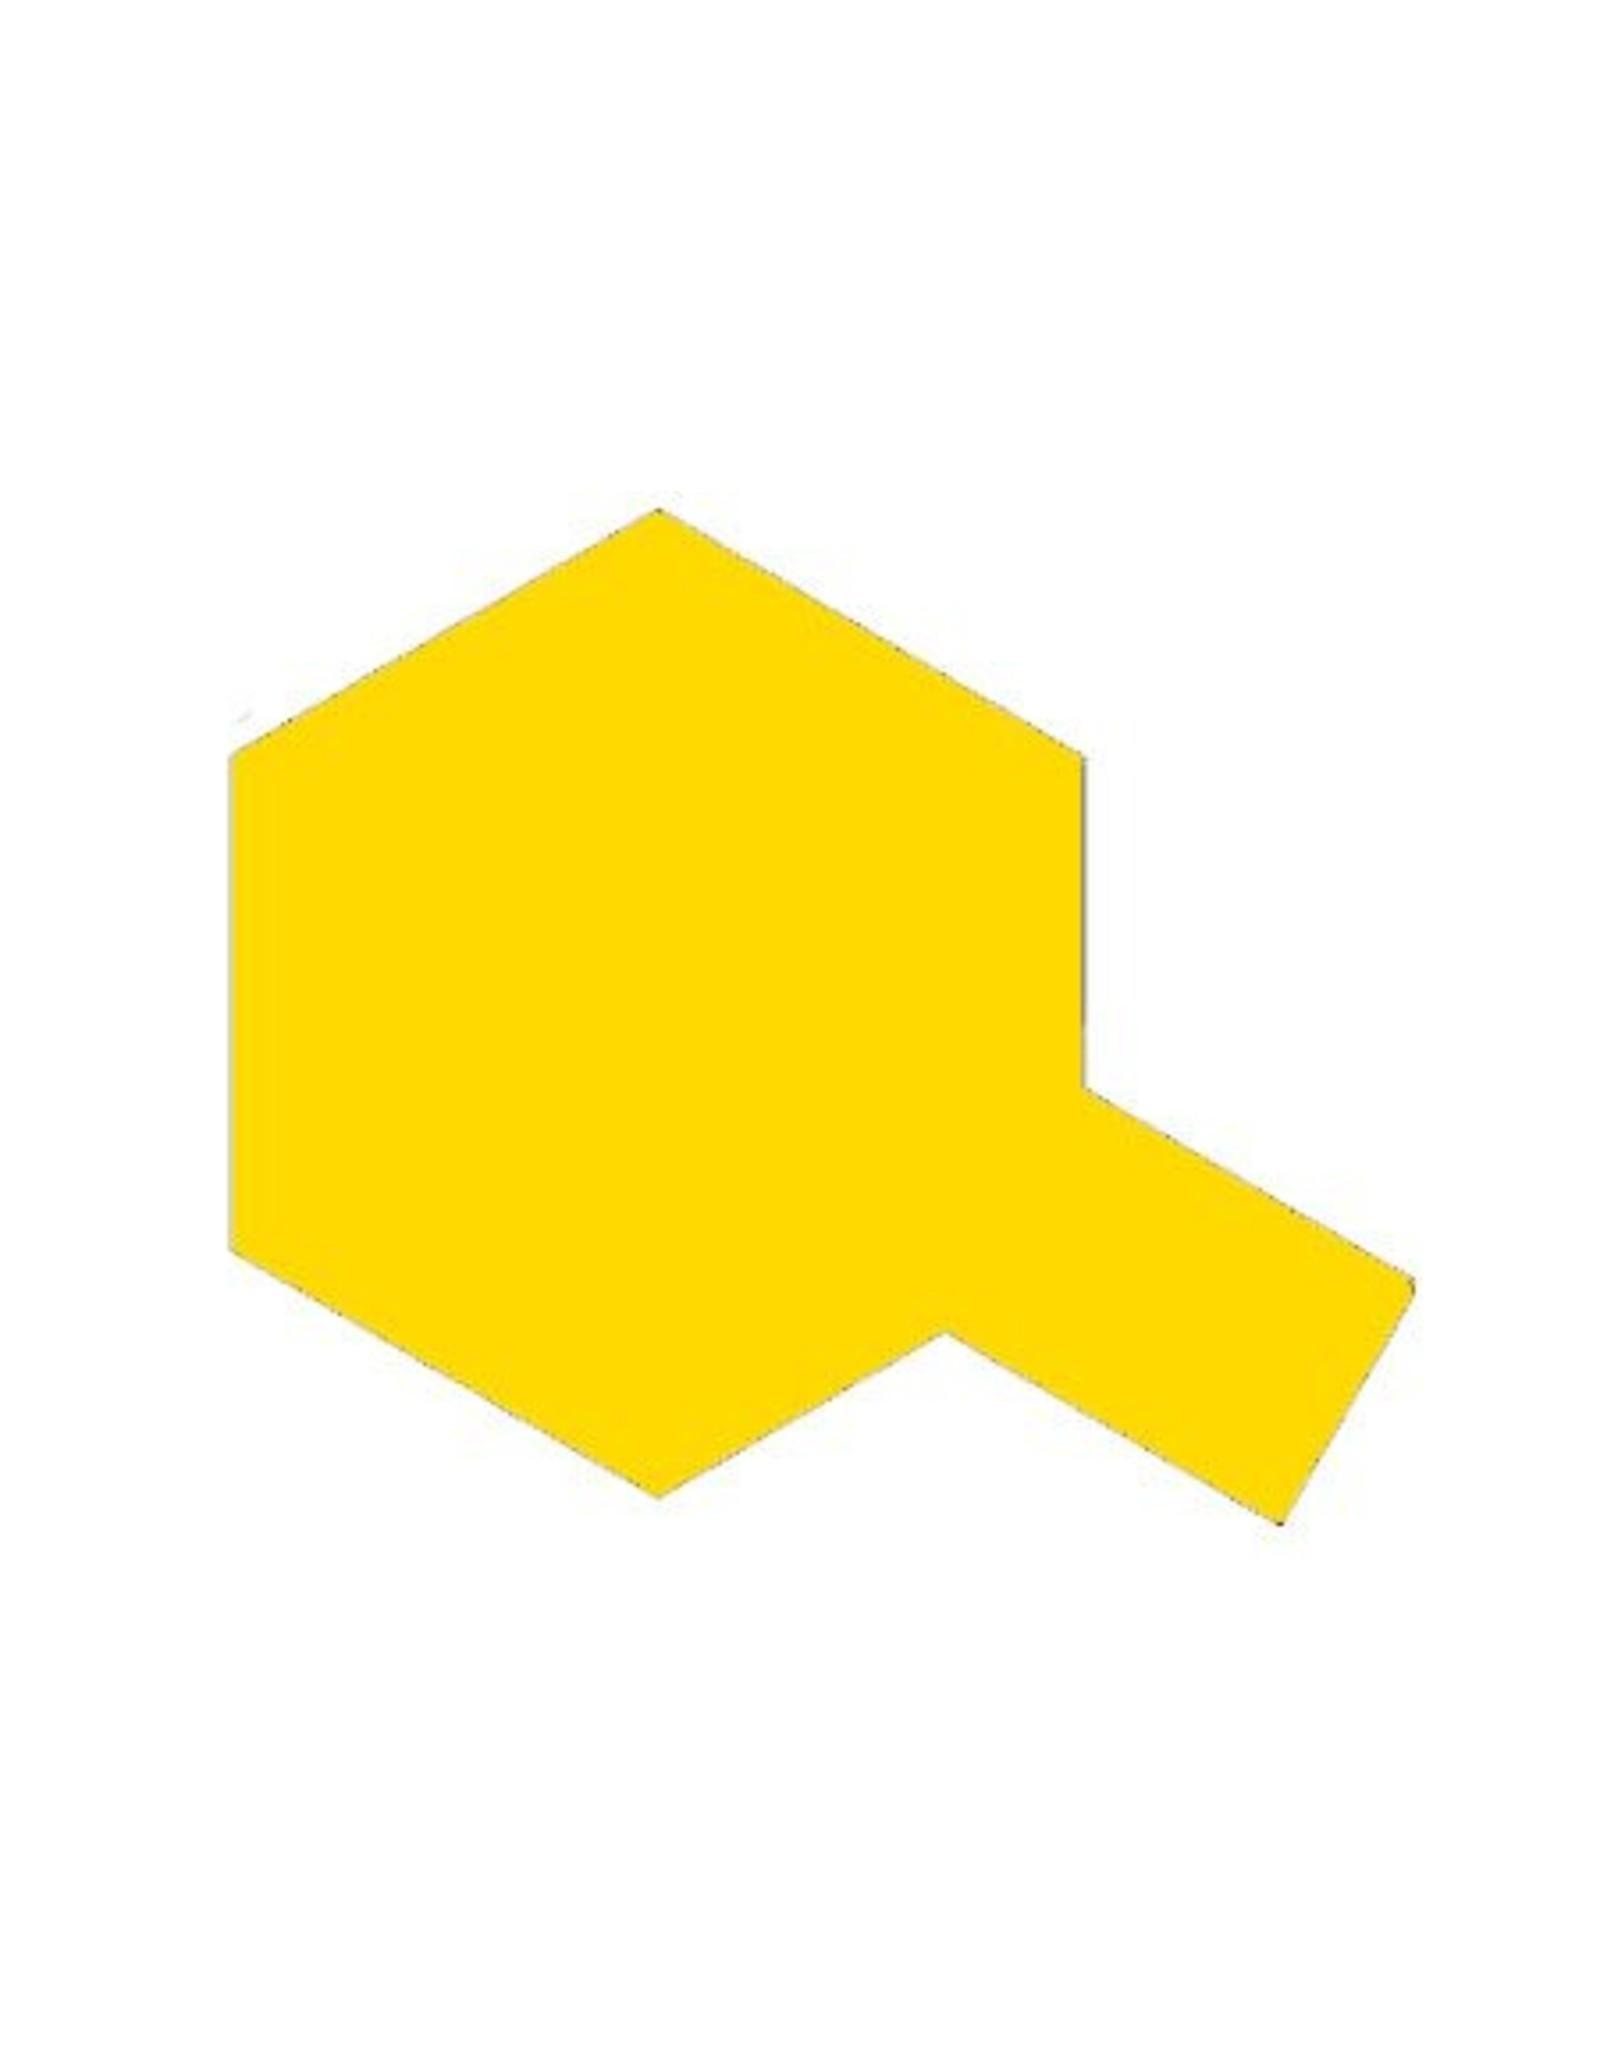 Tamiya Acrylic Mini X-8 Lemon Yellow